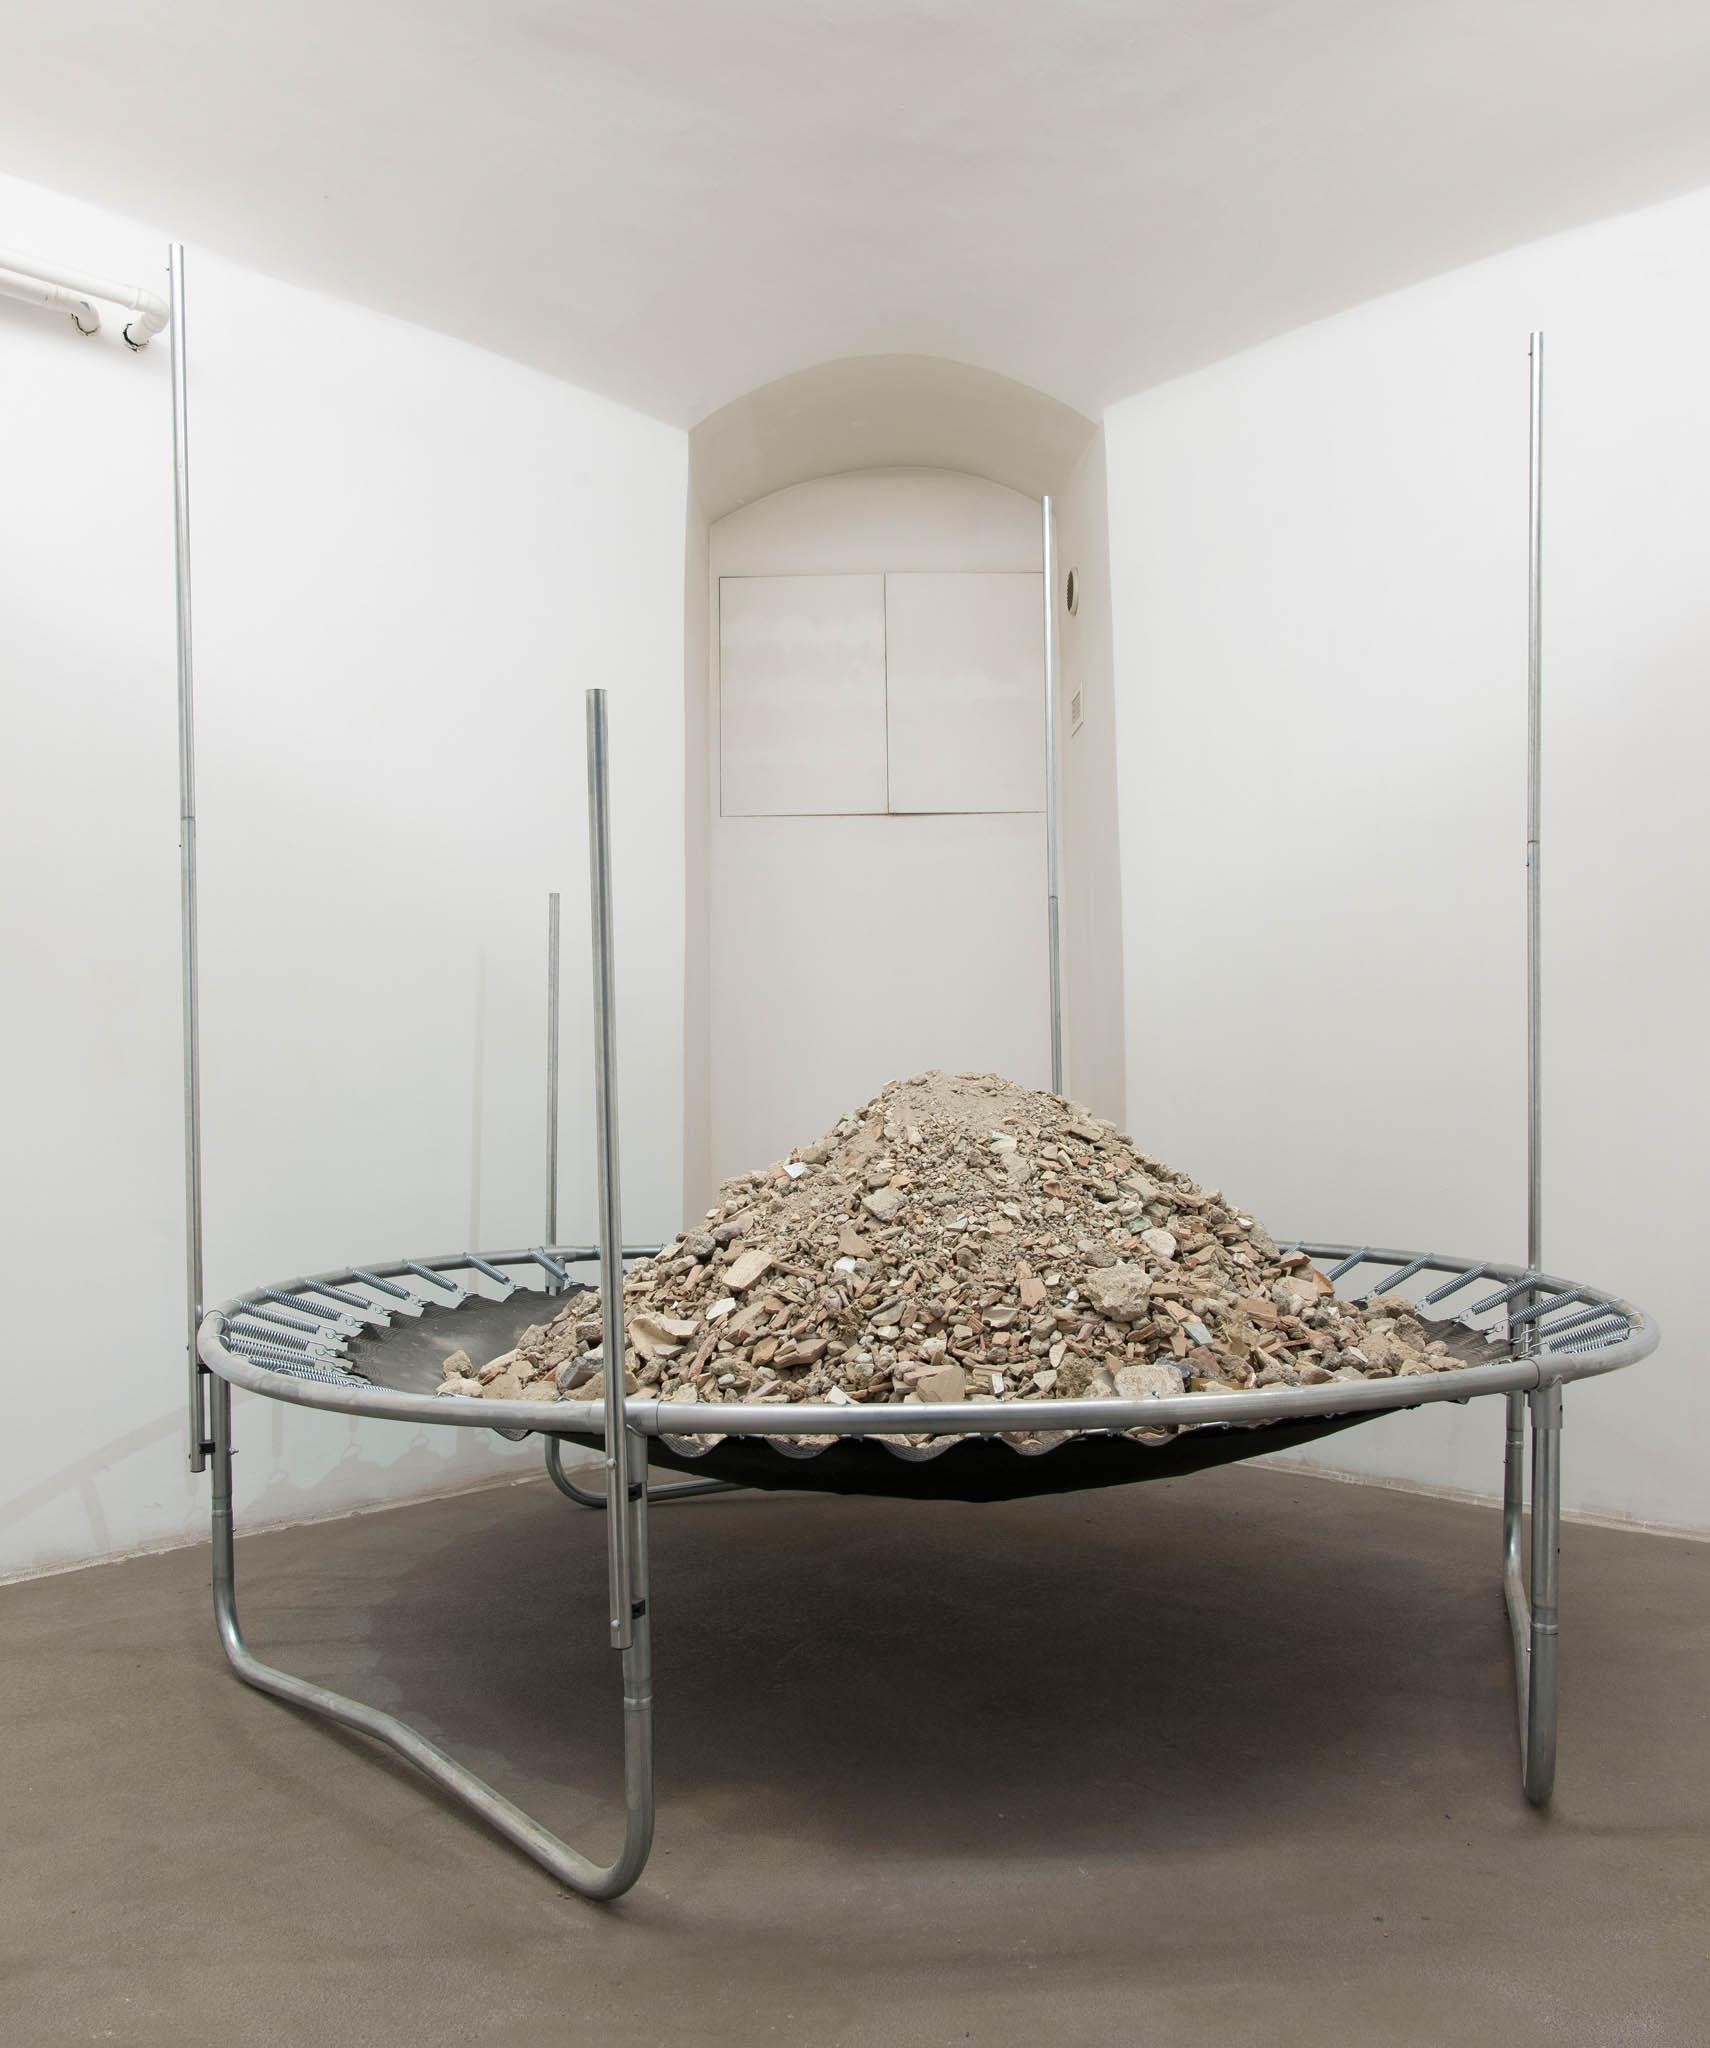 4. Mircea Cantor Haiku Under Tension, 2017; trampolino, macerie; foto Giorgio Benni